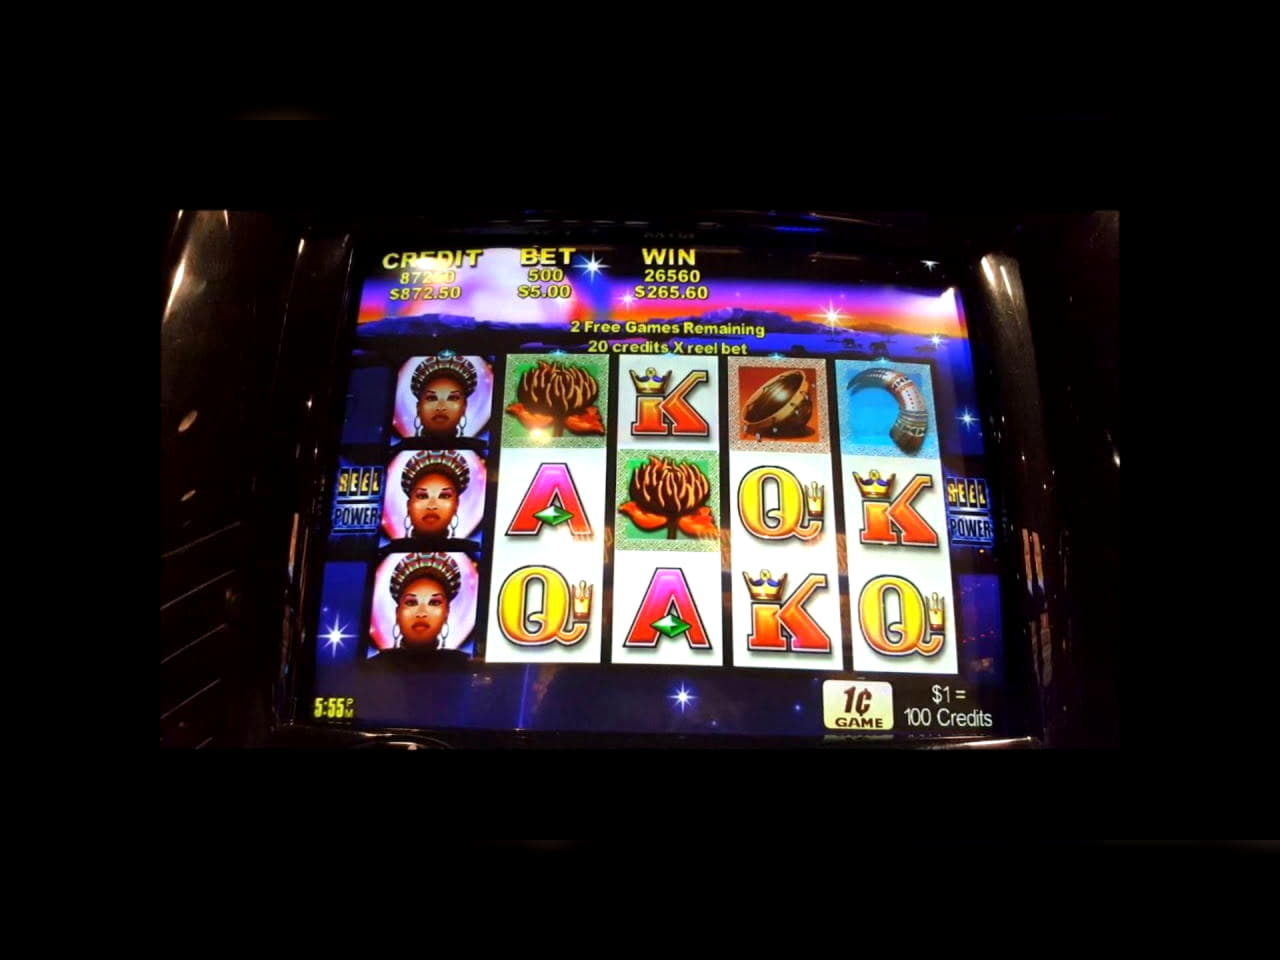 EURO 635 FREE Casino Chip at Treasure Island Jackpots Casino (Australia Casino Mirror)